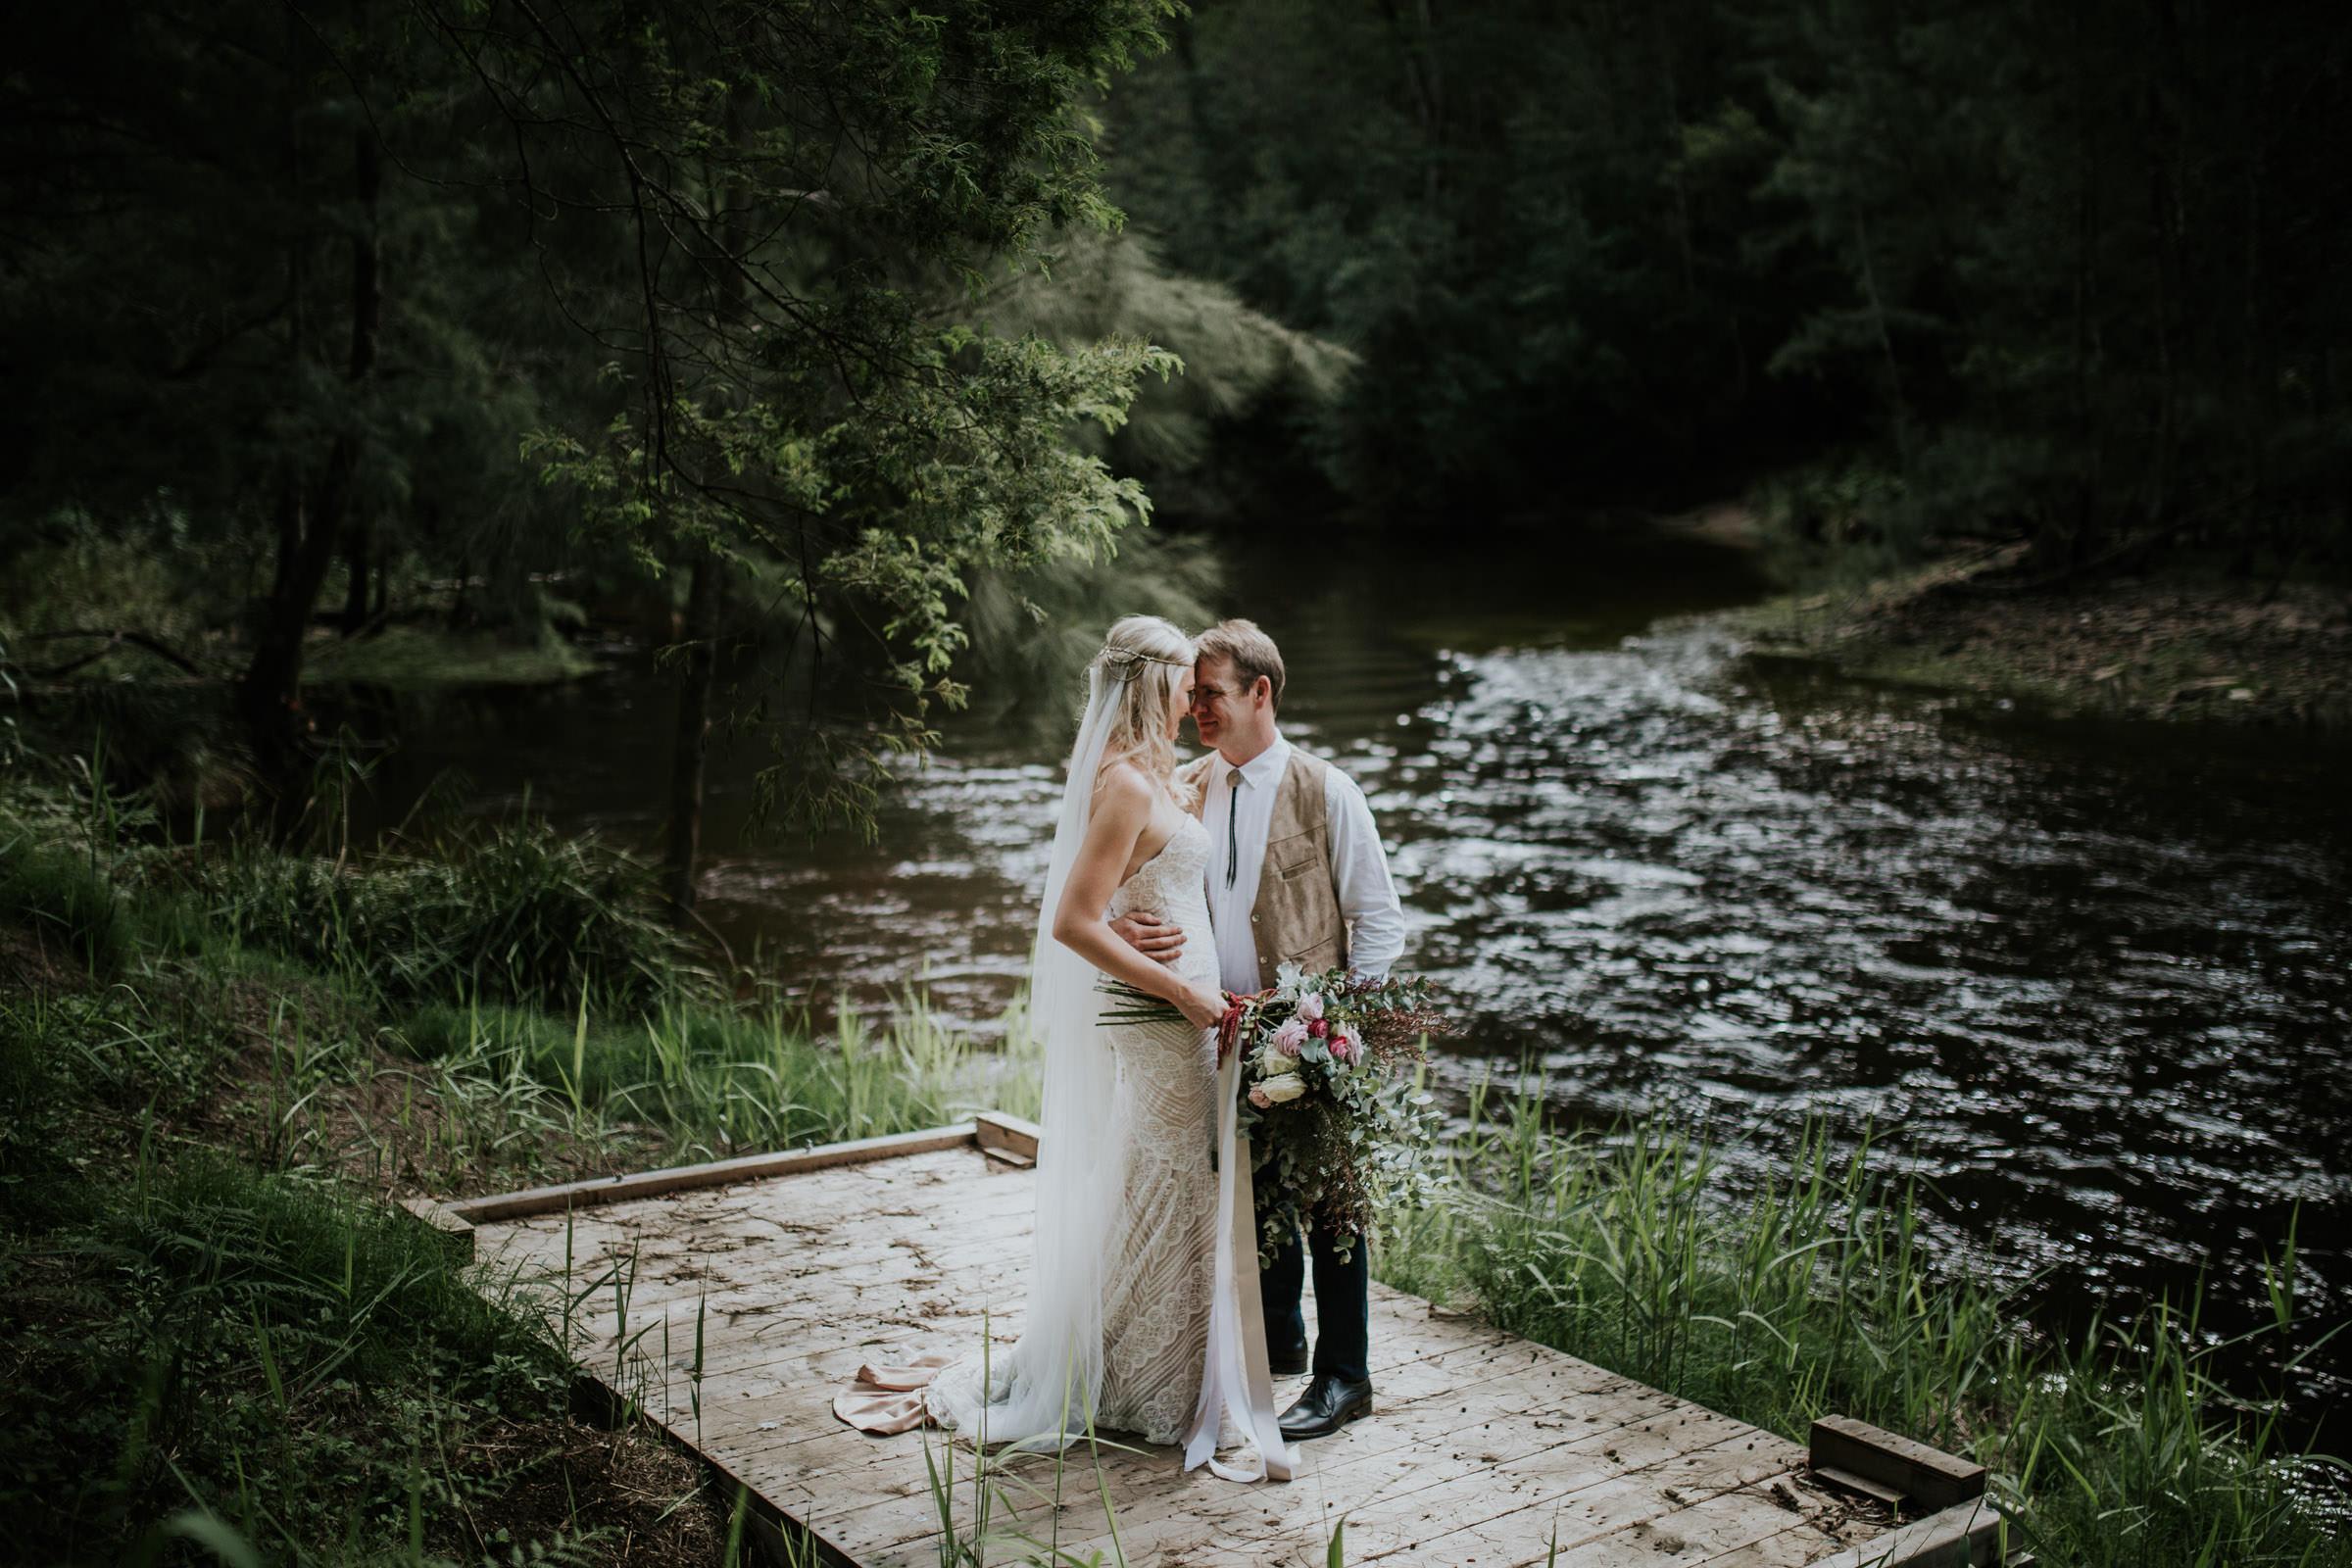 Emma+John+Far+South+Coast+Wedding+Festivl+Glamping+Bush-118.jpg